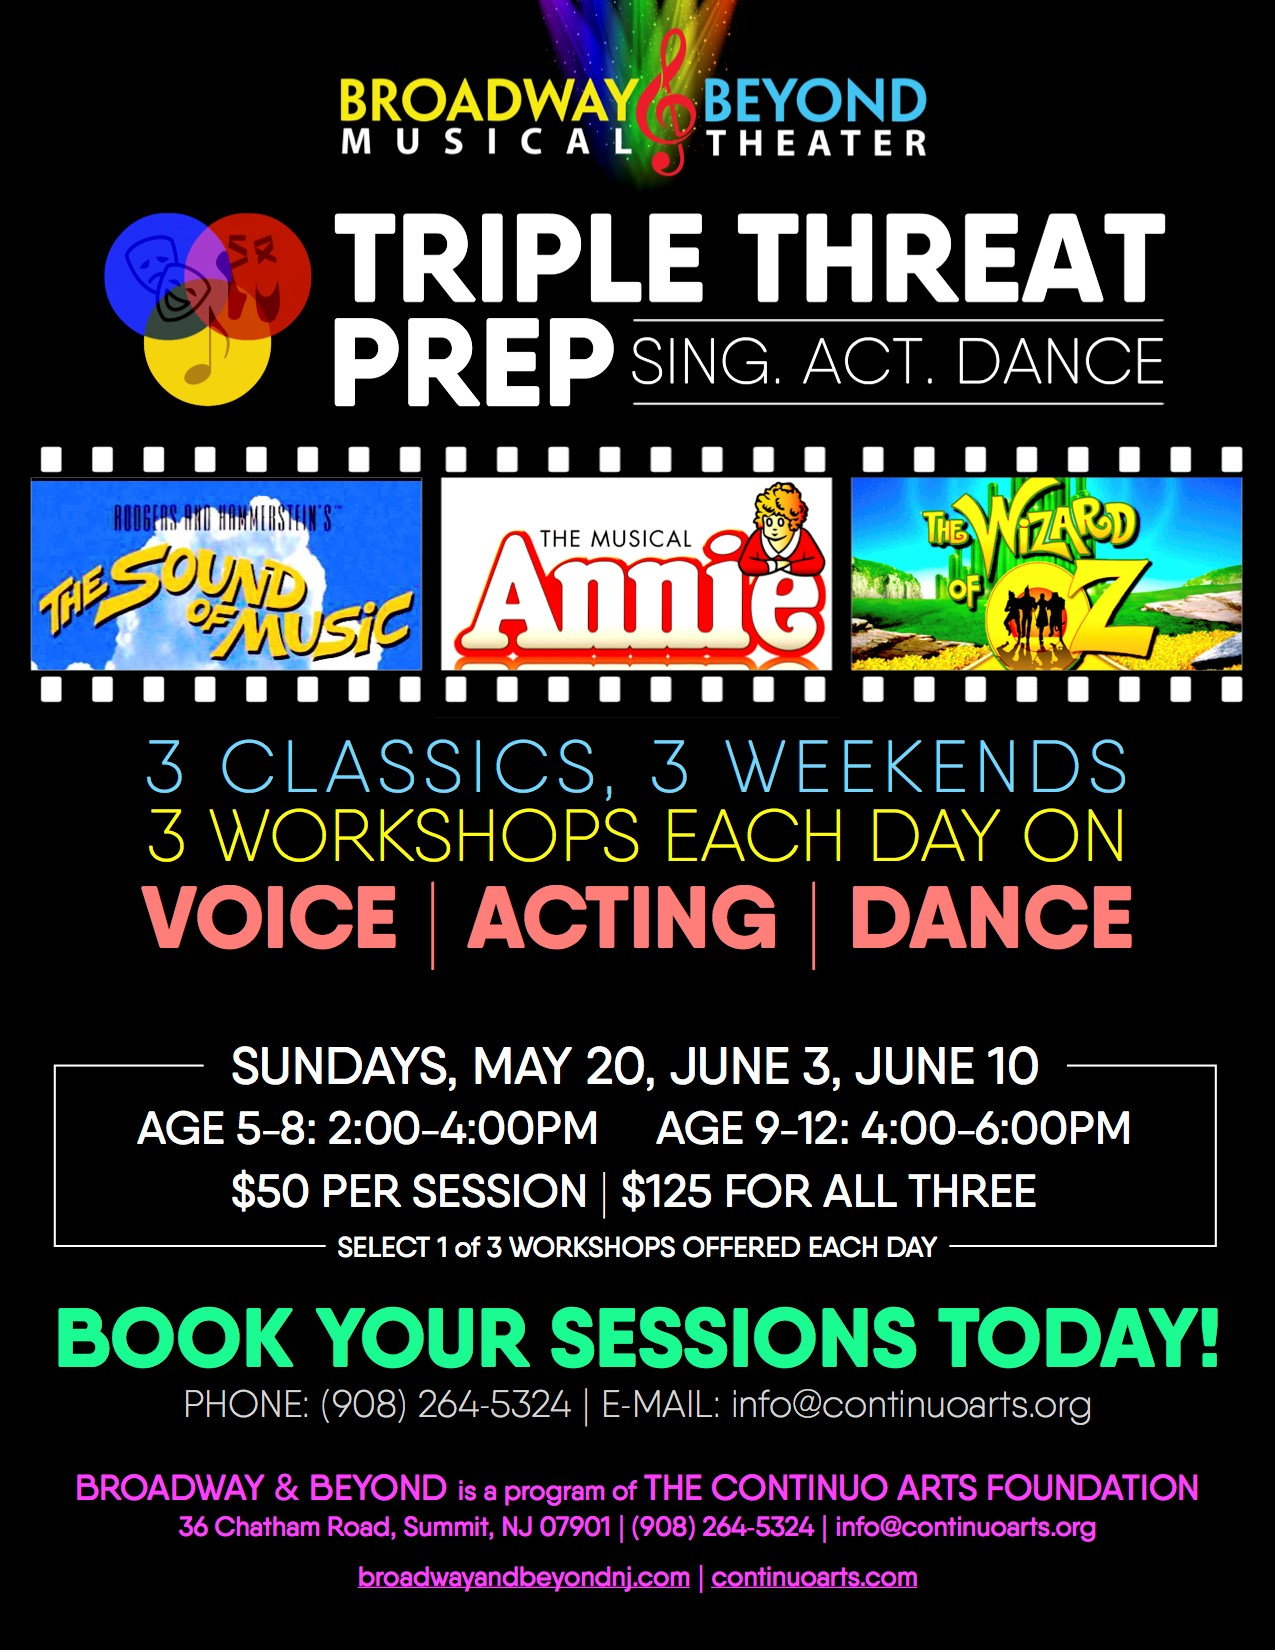 Triple Threat Prep Session II